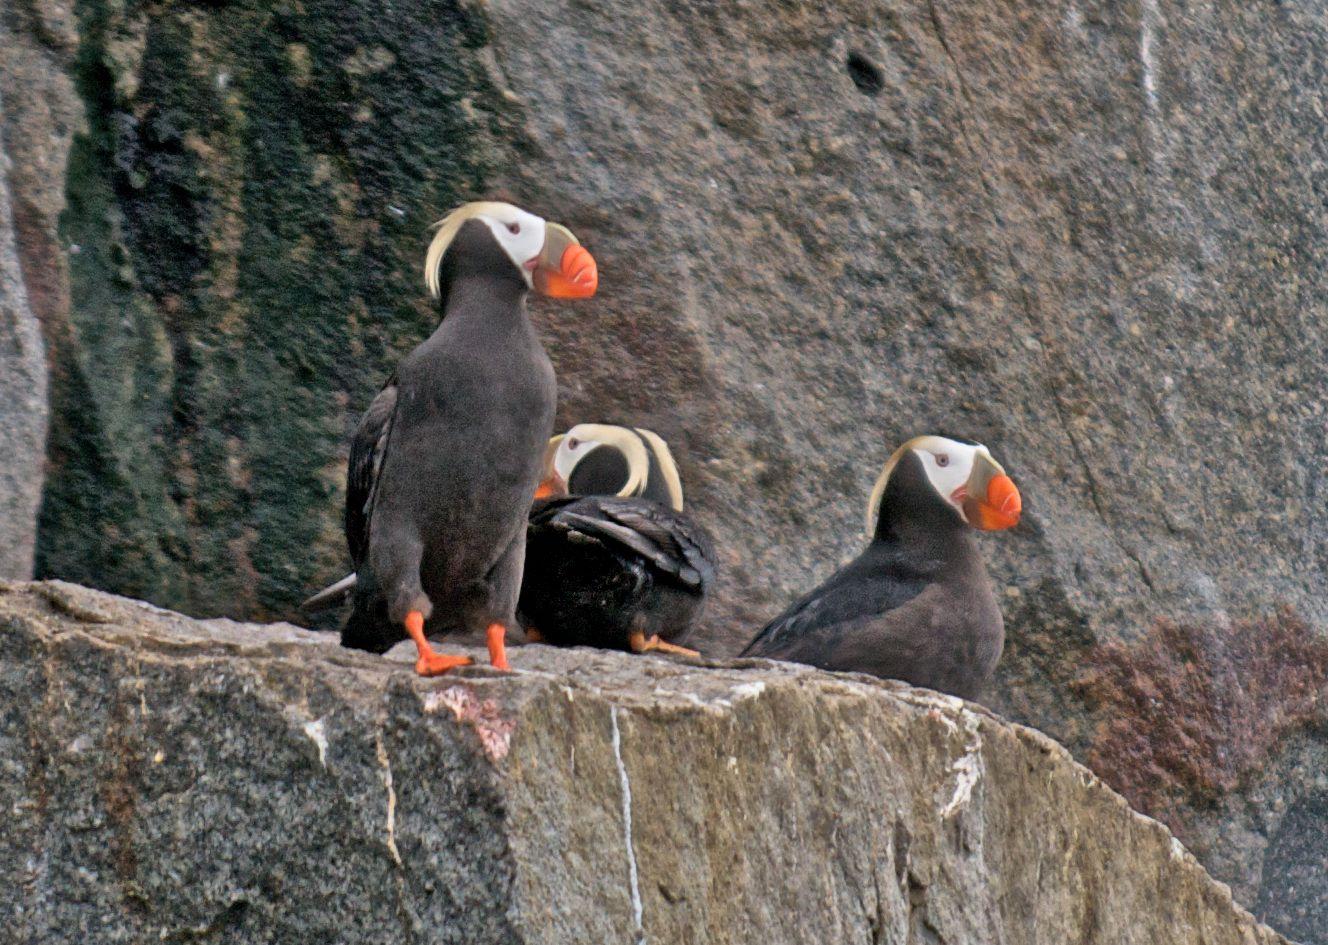 Wrangel Island Penguins